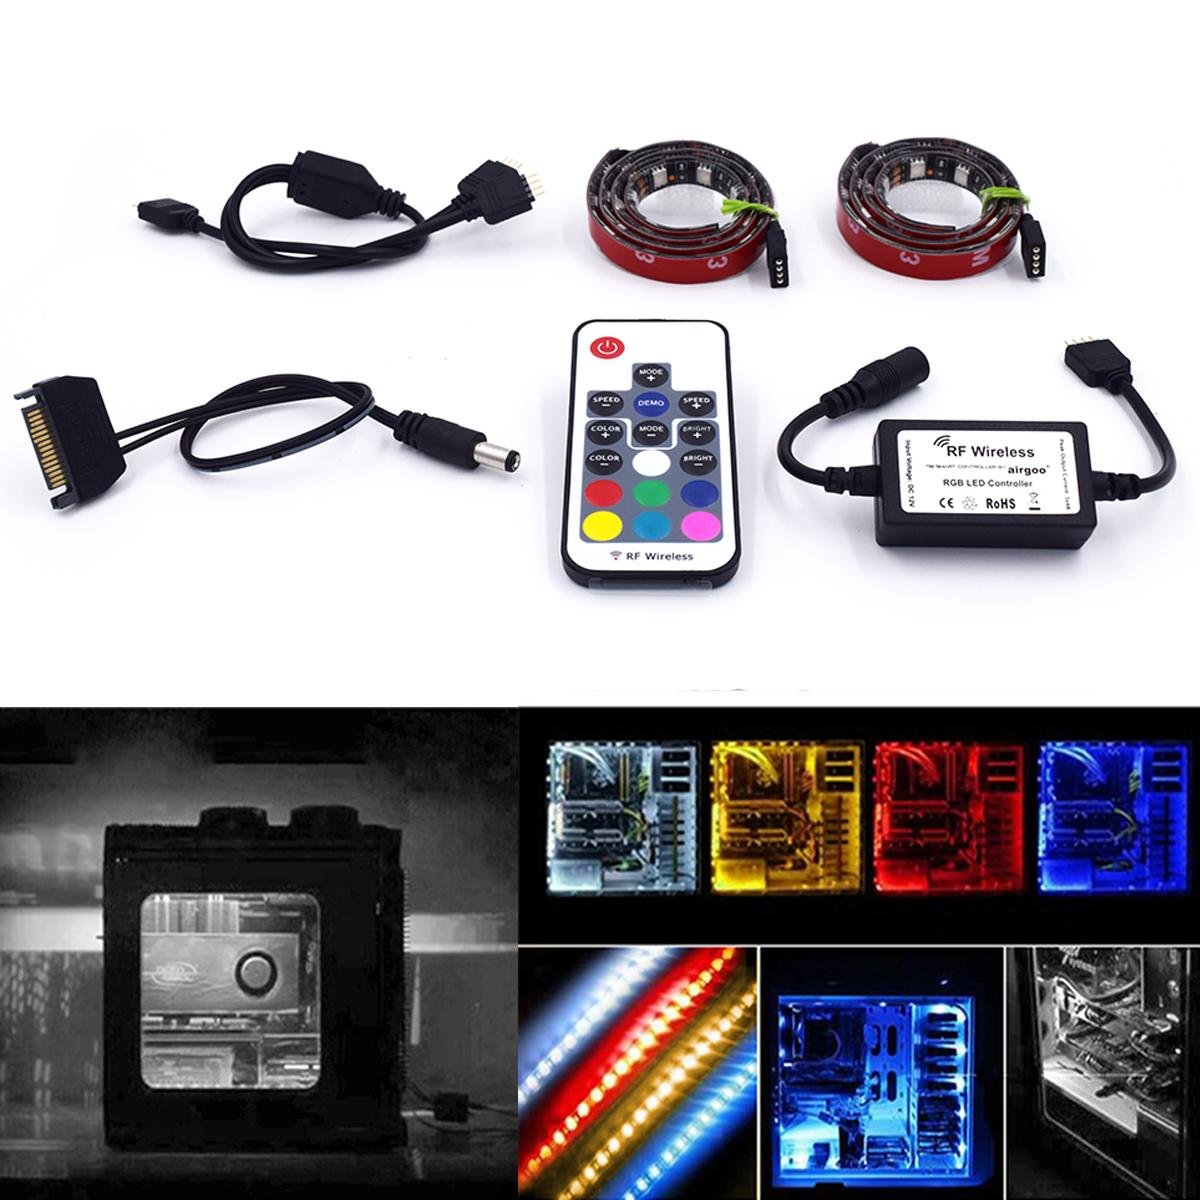 Super Bright Computer Led Strip Kit Vibrant Options Solid Color Leds Lighting Lights Rgb Multi 2pcs 20inch Light With